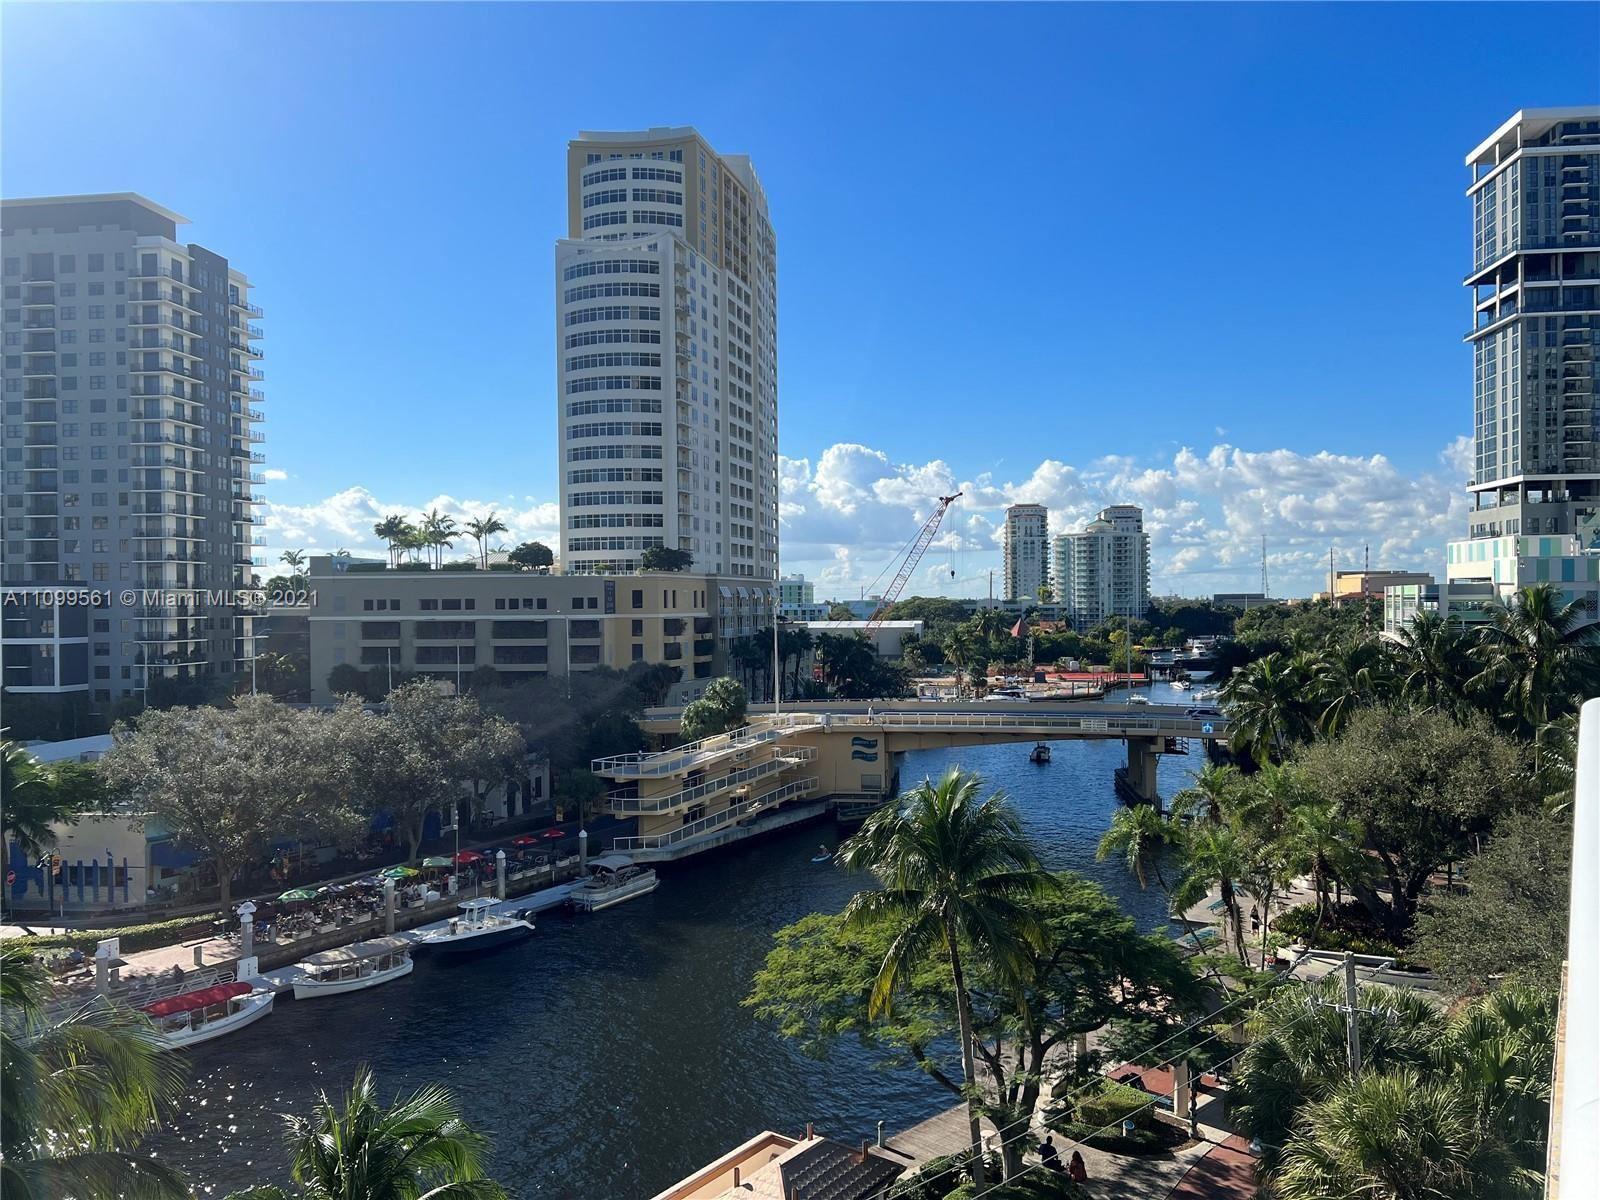 333 LAS OLAS WY #1207, Fort Lauderdale, FL 33301 - #: A11099561